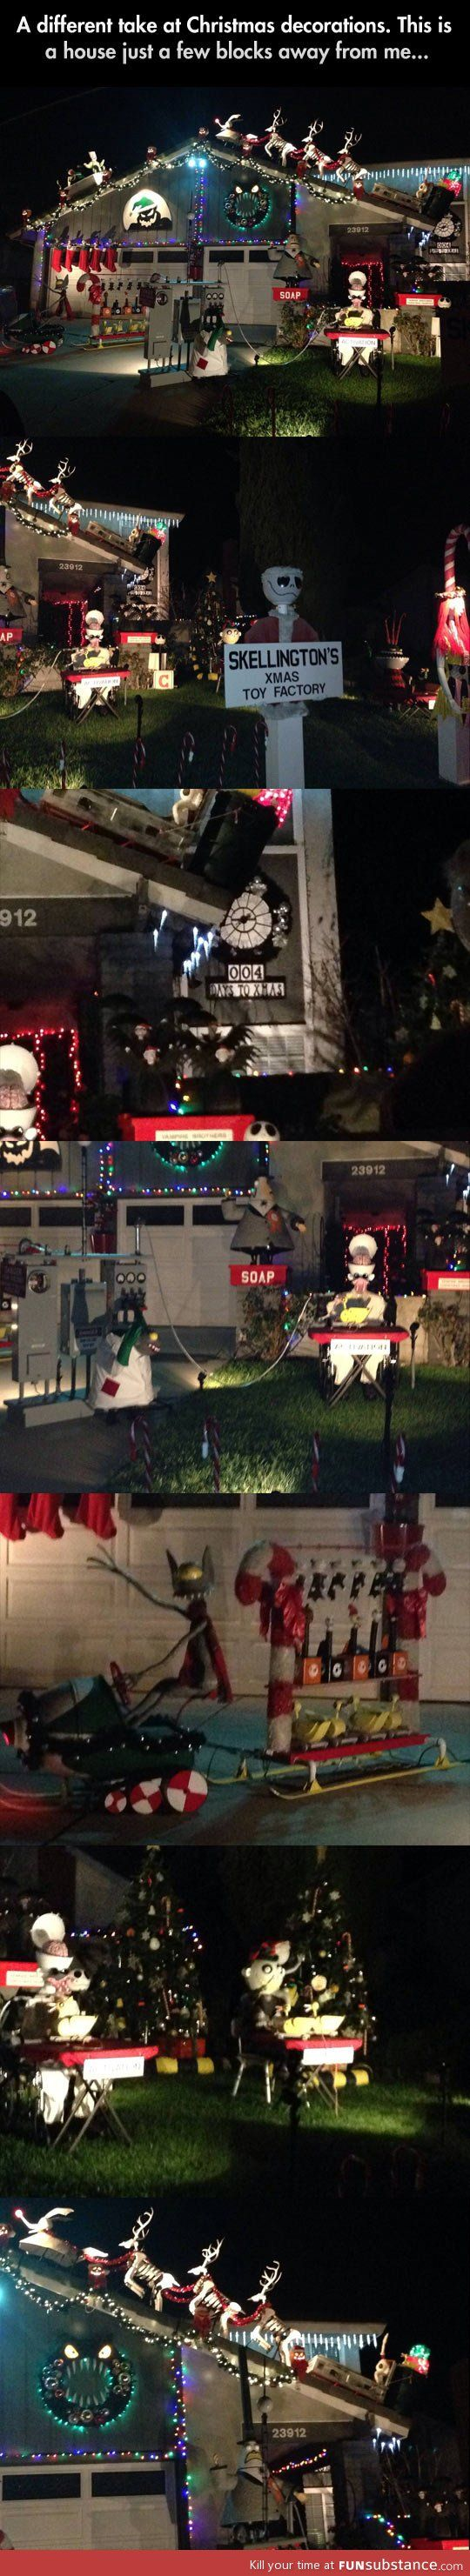 Jack Skellington's Christmas decoration